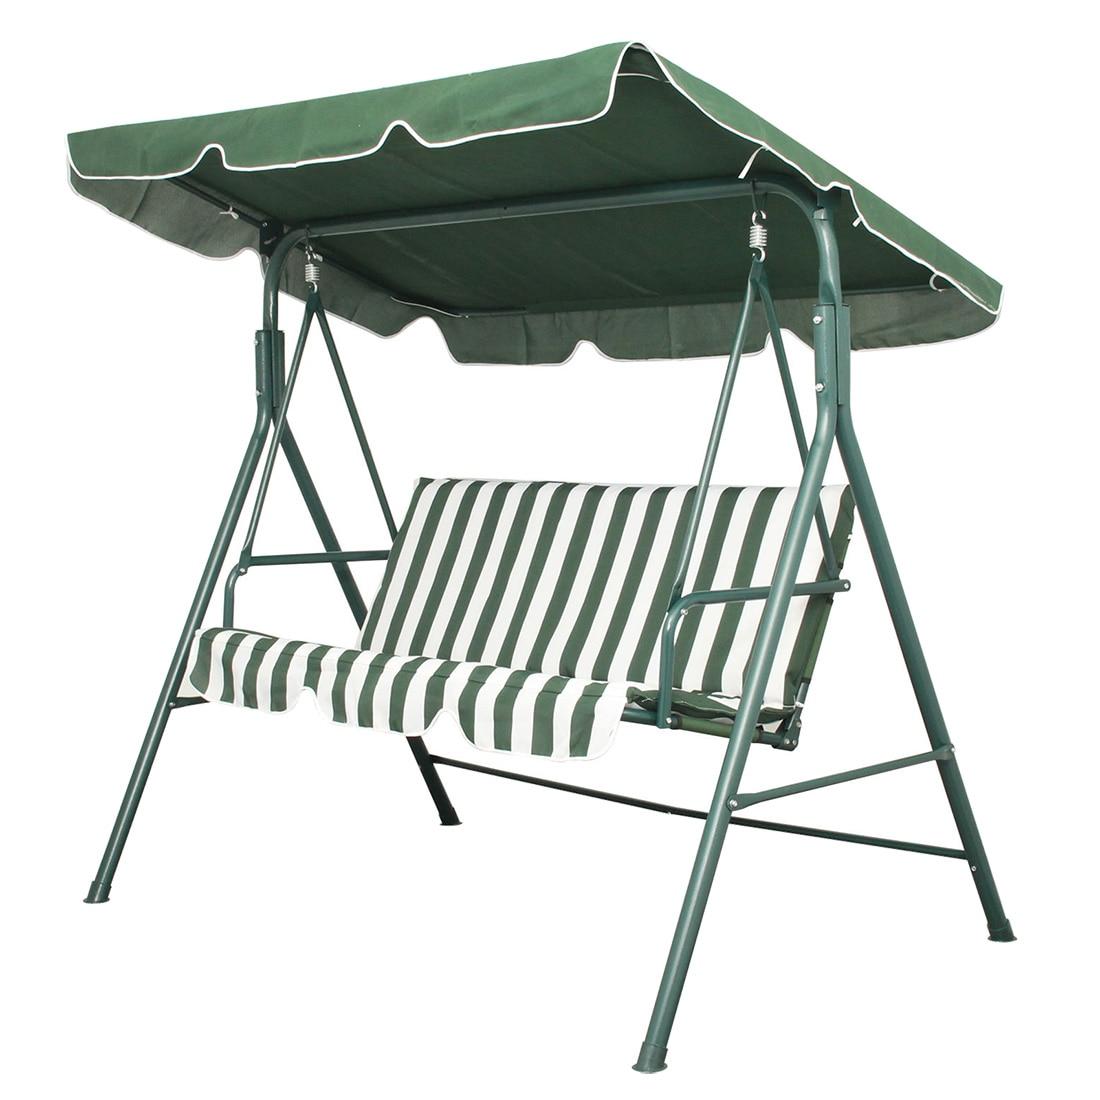 Garden Patio Metal Swing Chair Seat 3 Seater Hammock Bench Swinging Cushioned